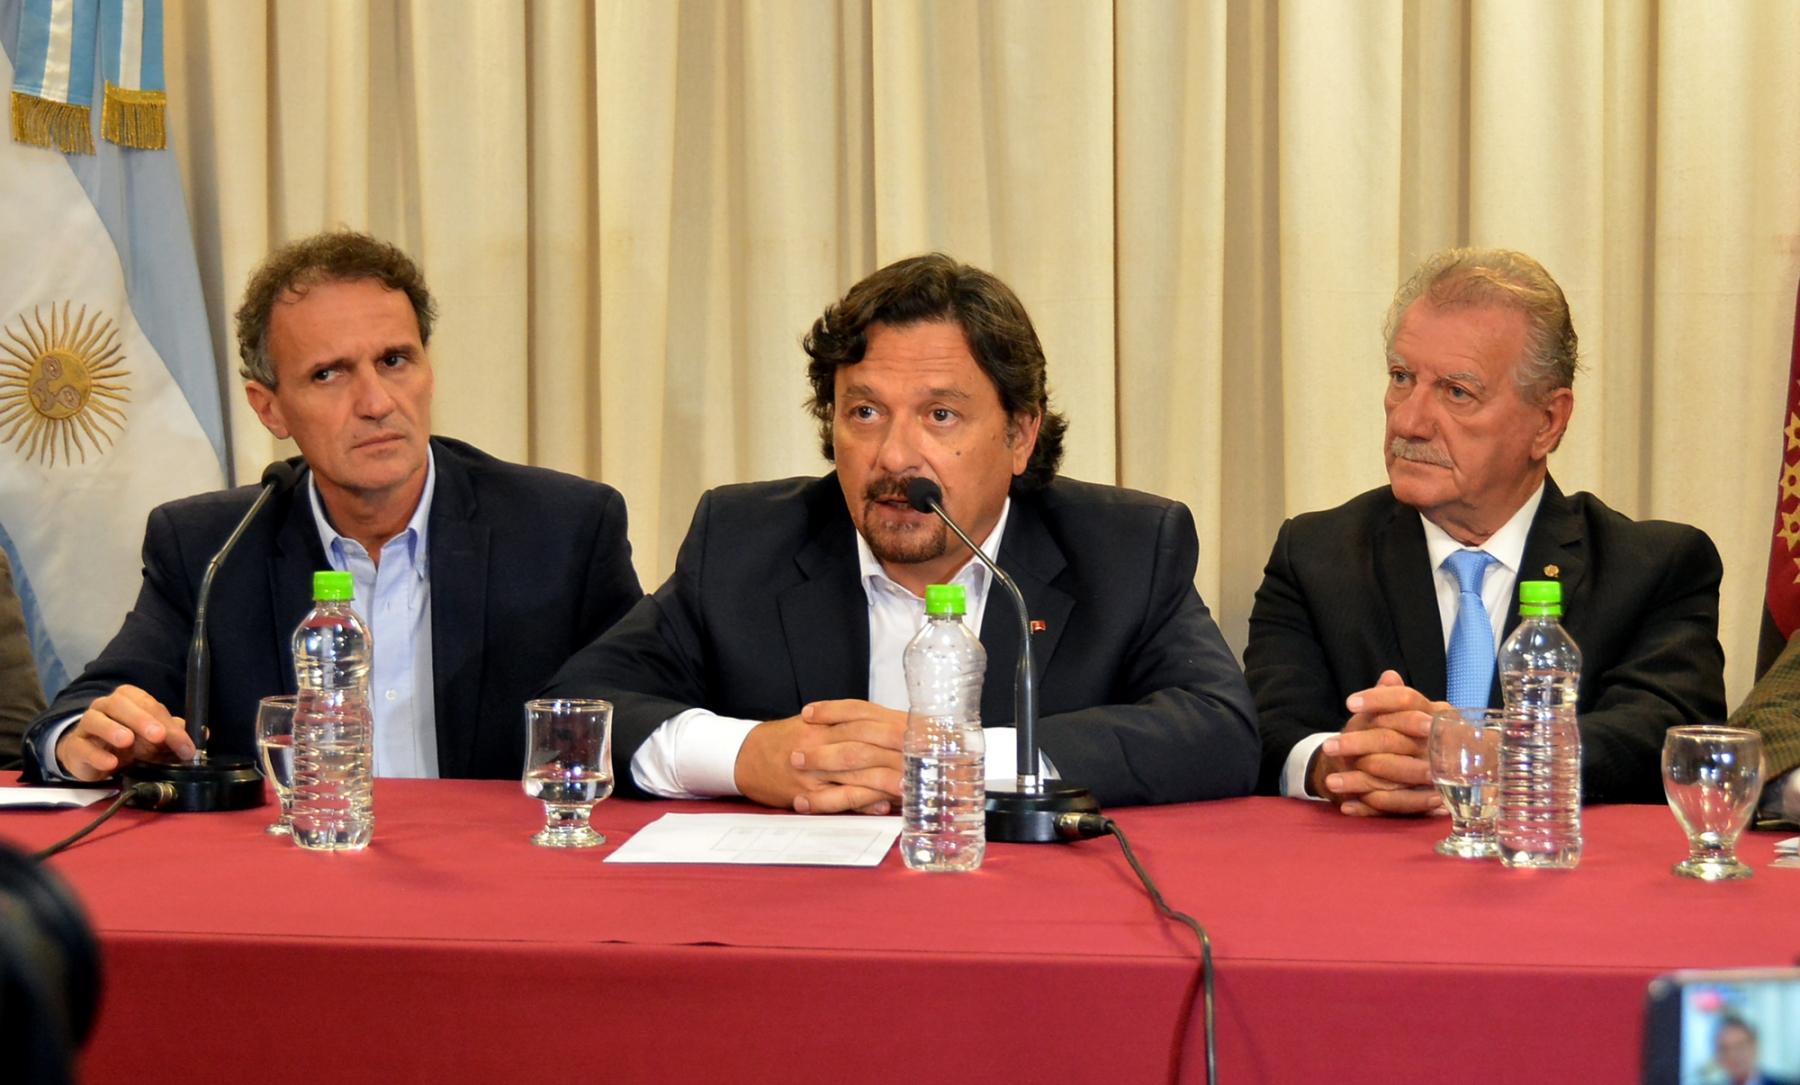 Anunciaron-importantes-obras-de-infraestructura-para-Salta-1